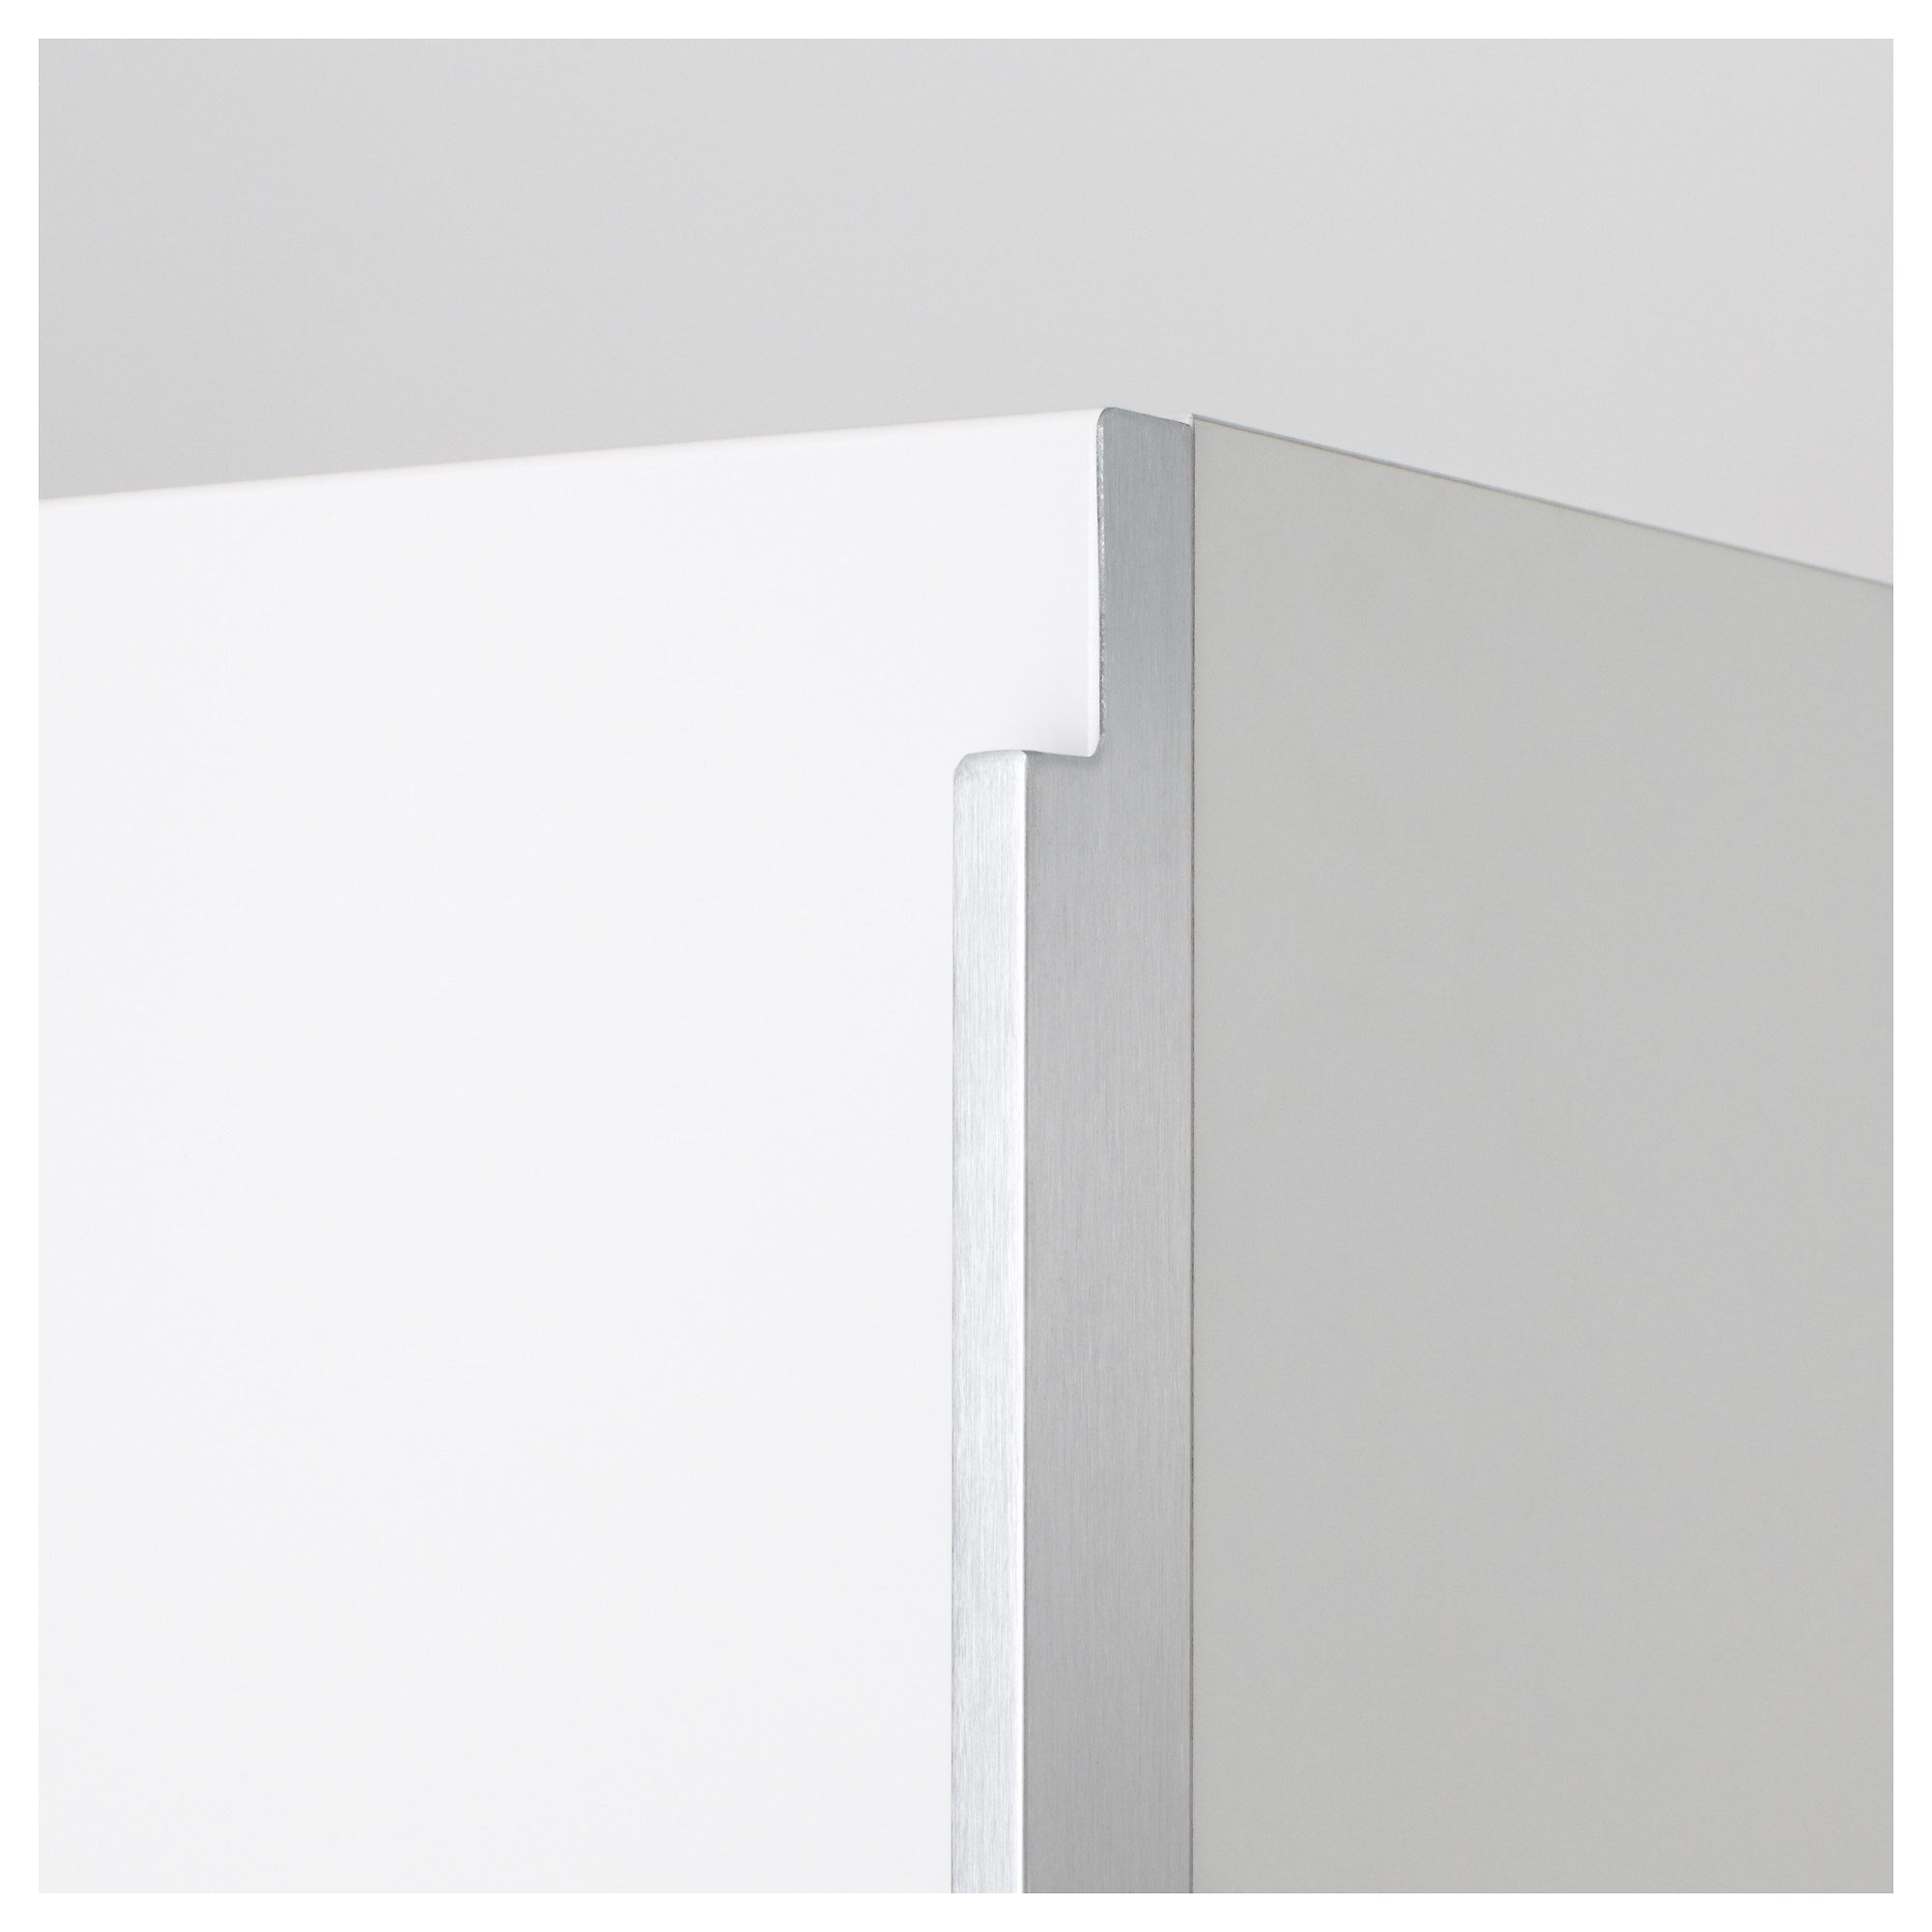 Ручка БЛАНКЕТТ артикуль № 103.988.39 в наличии. Онлайн каталог IKEA РБ. Недорогая доставка и монтаж.